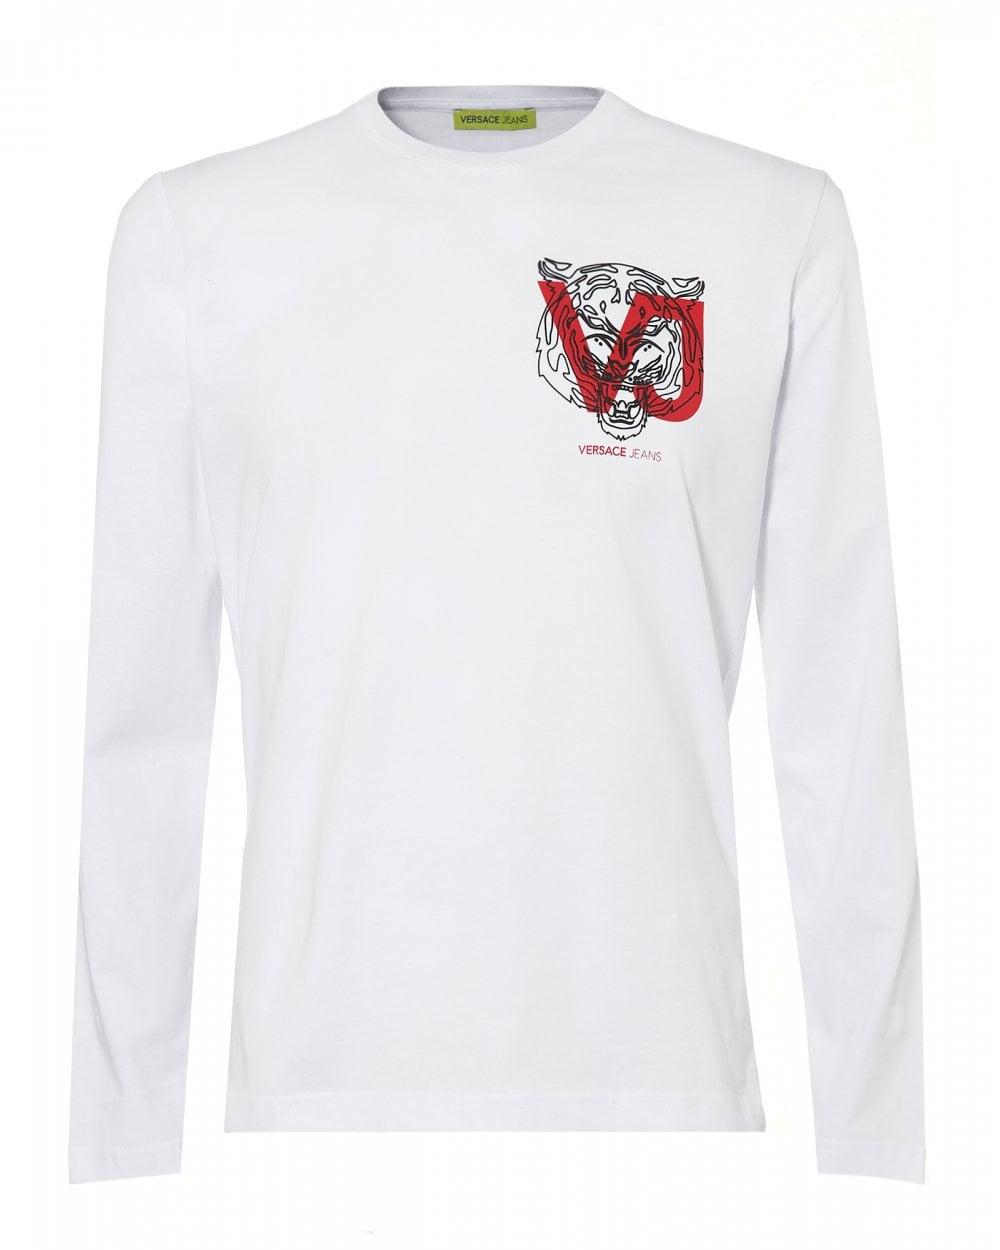 02635e34 Mens Chest Tiger VJ Logo T-Shirt, White Slim Fit Tee